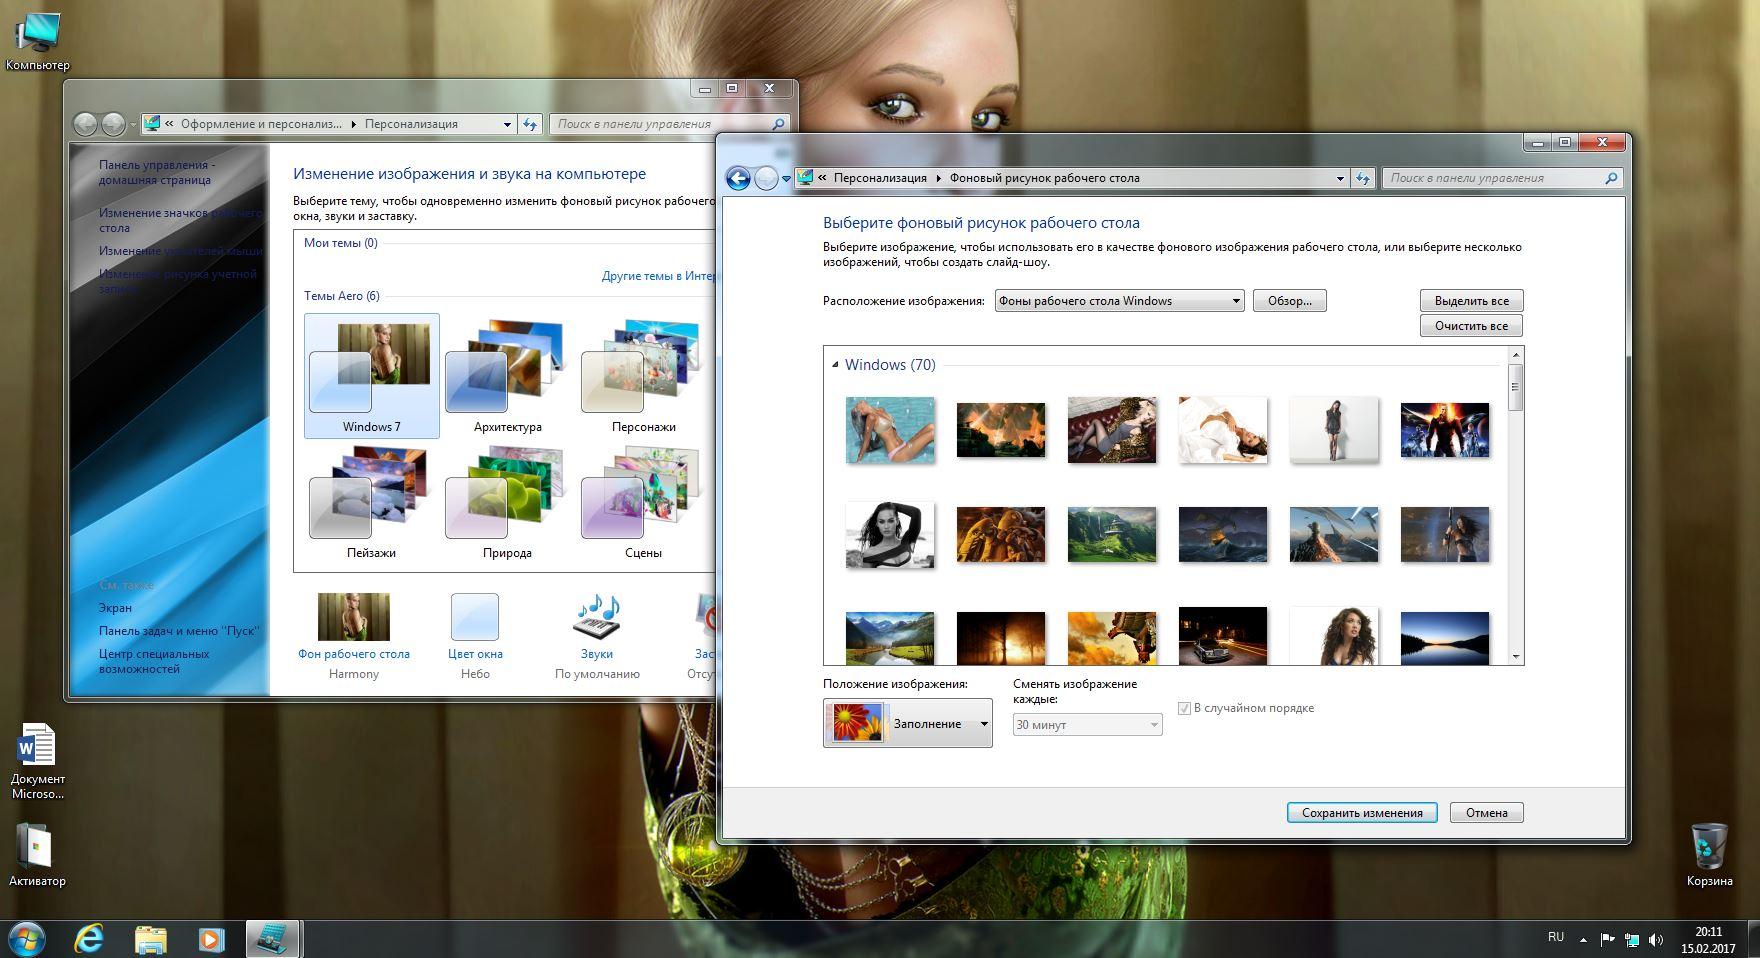 Microsoft Windows 7 Professional 64 Bit скачать